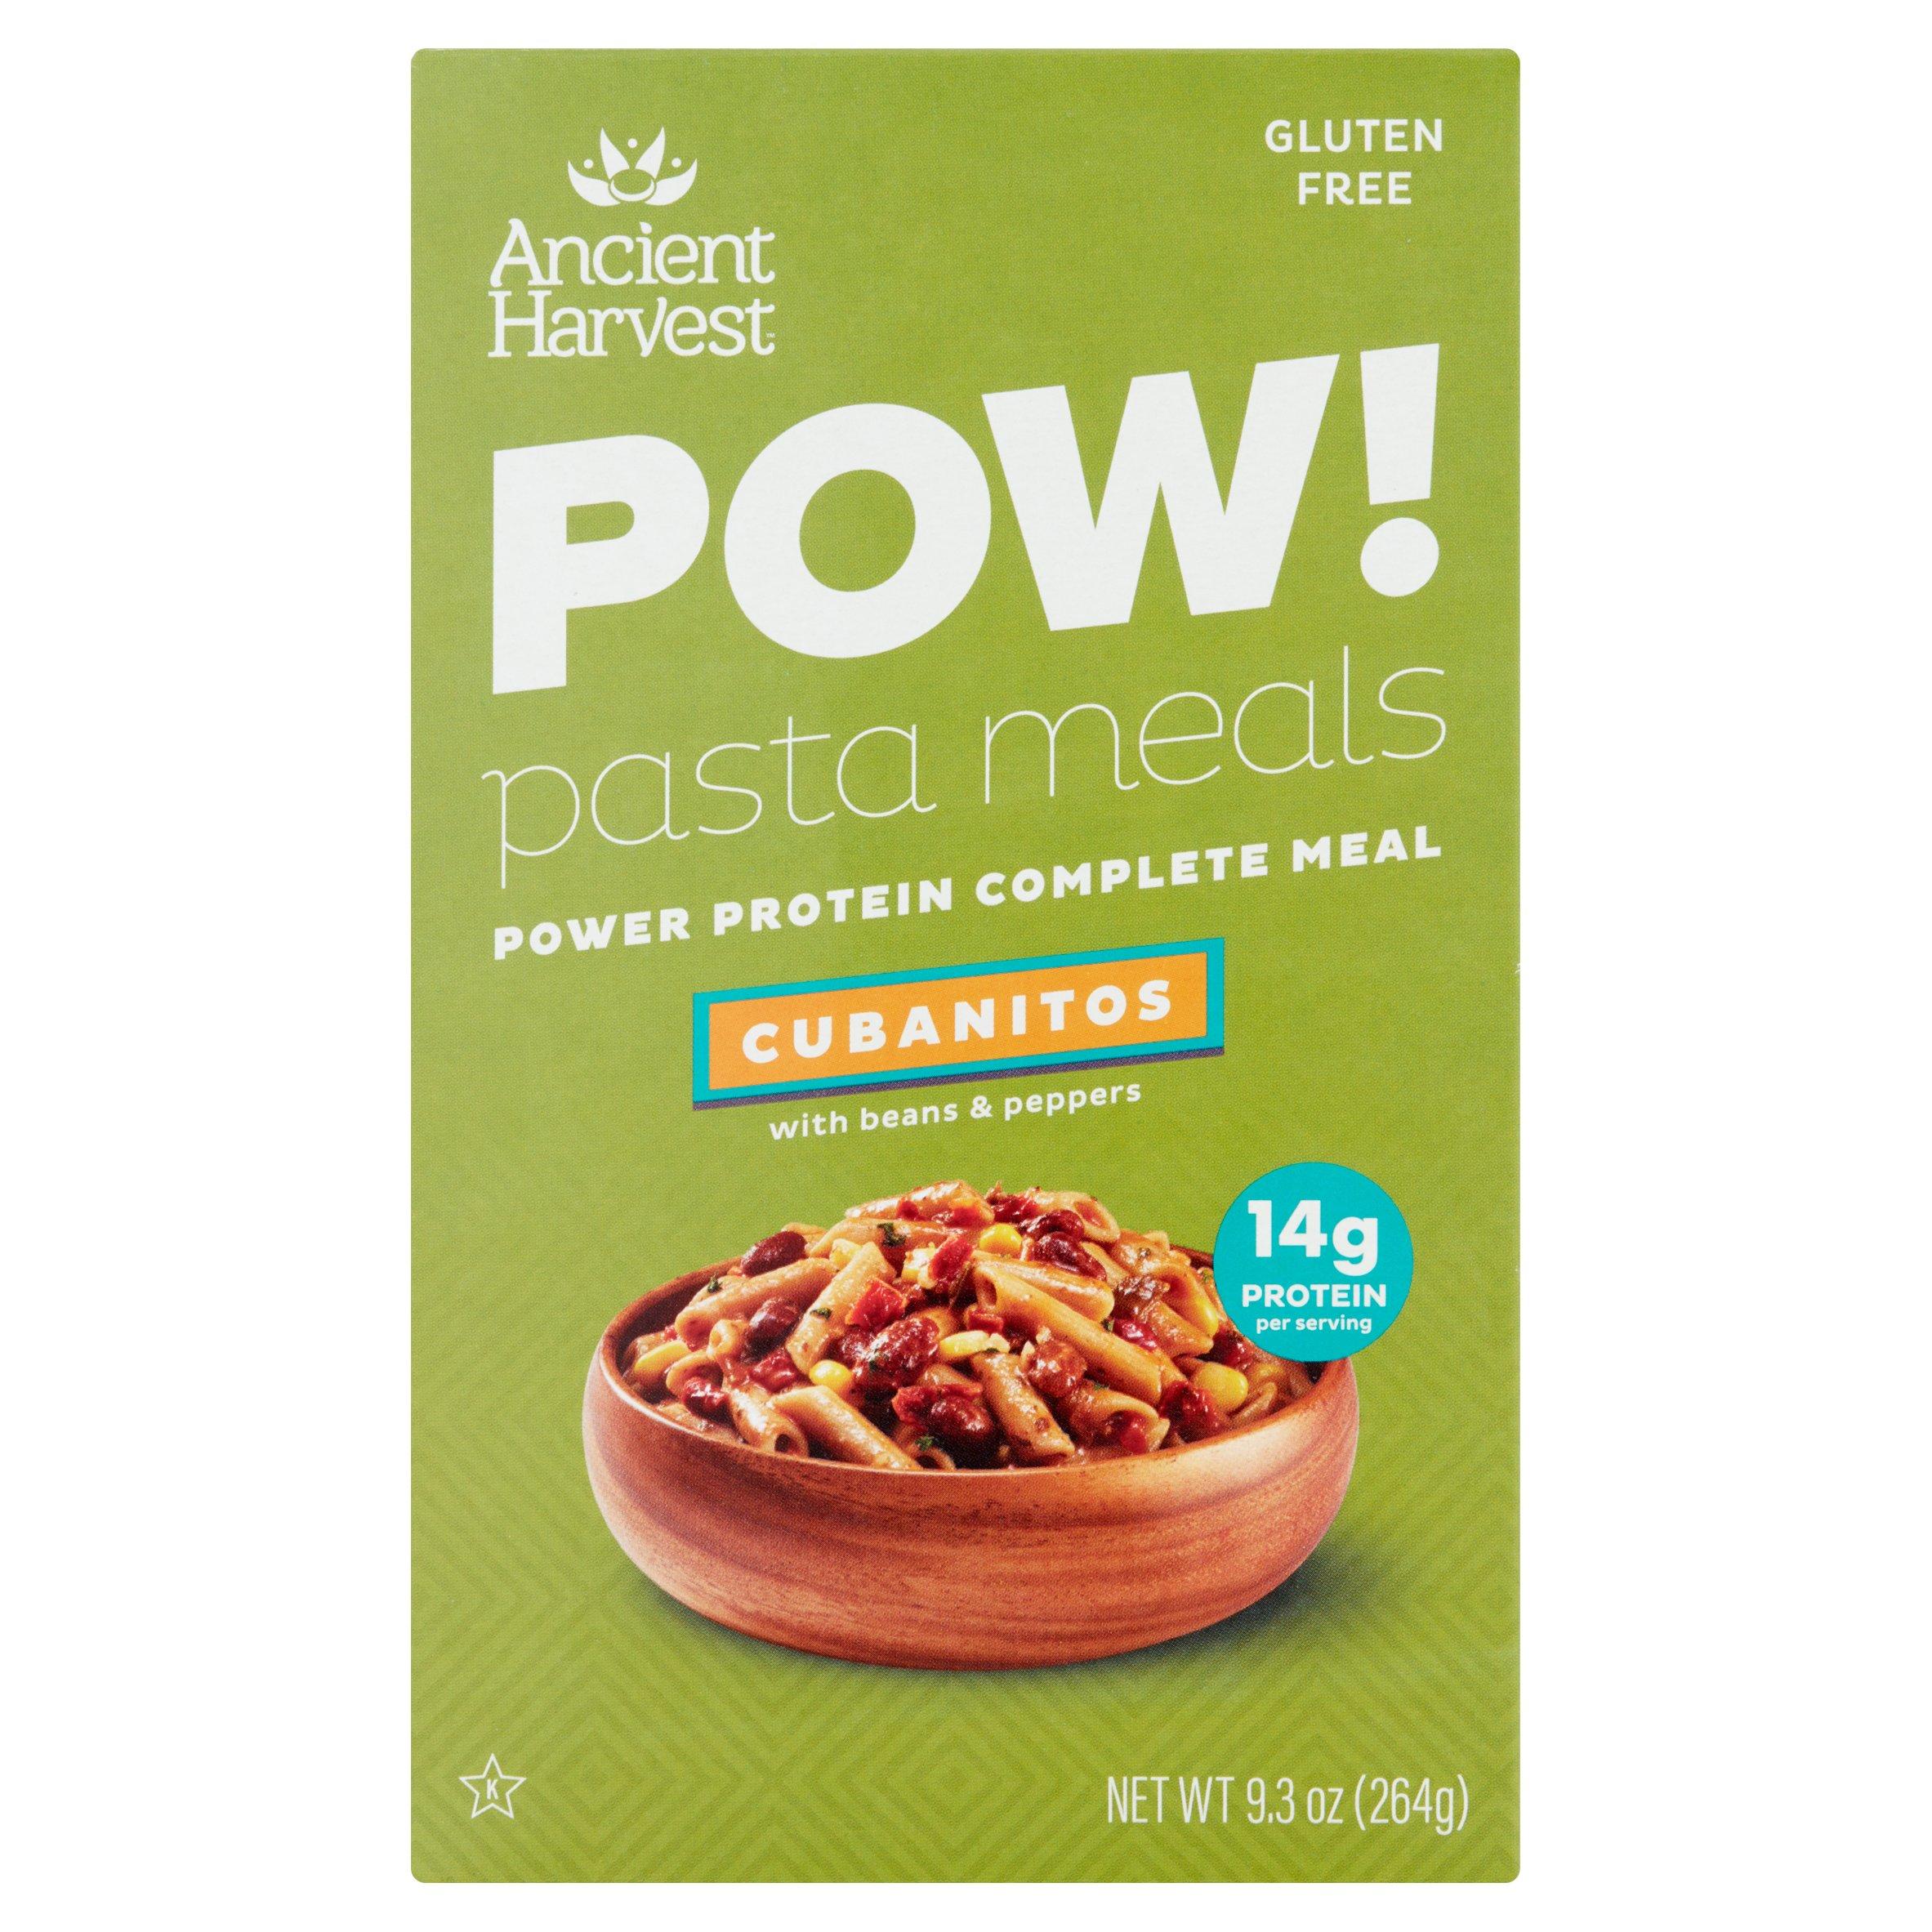 Ancient Harvest Pow! Cubanitos Pasta Meals, 9.3 oz by Ancient Harvest